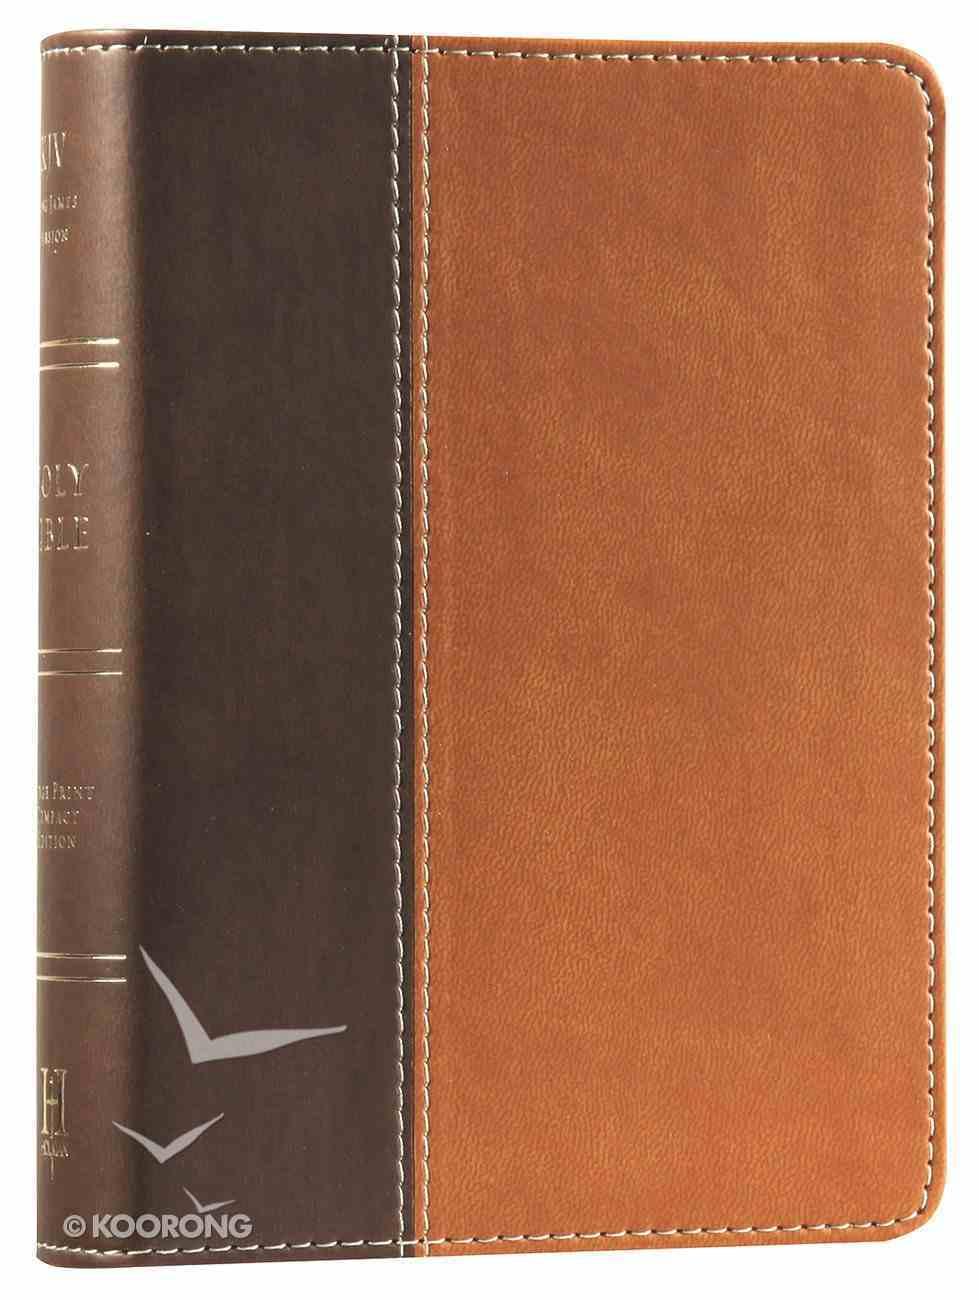 KJV Large Print Compact Bible Dark Brown/Light Brown Duotone Imitation Leather